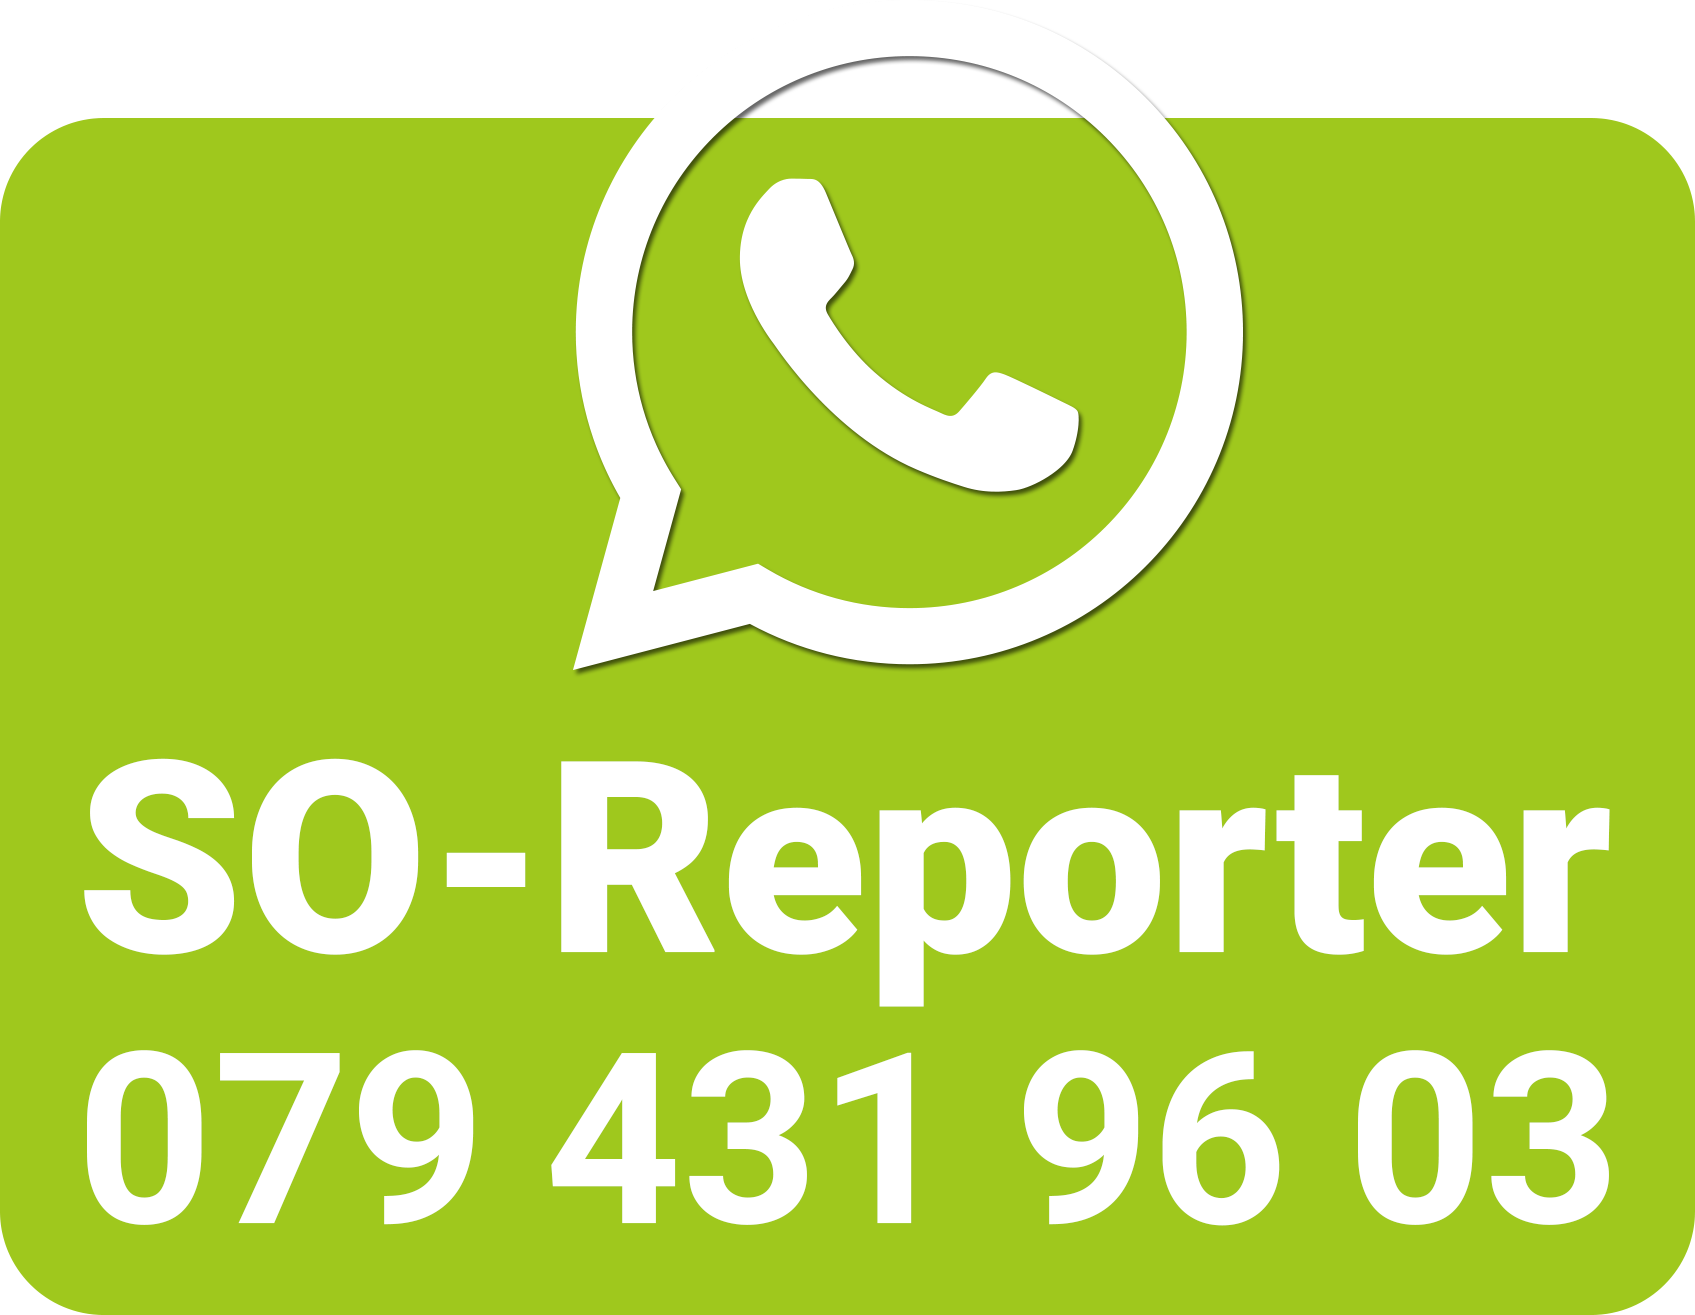 so-reporter-image